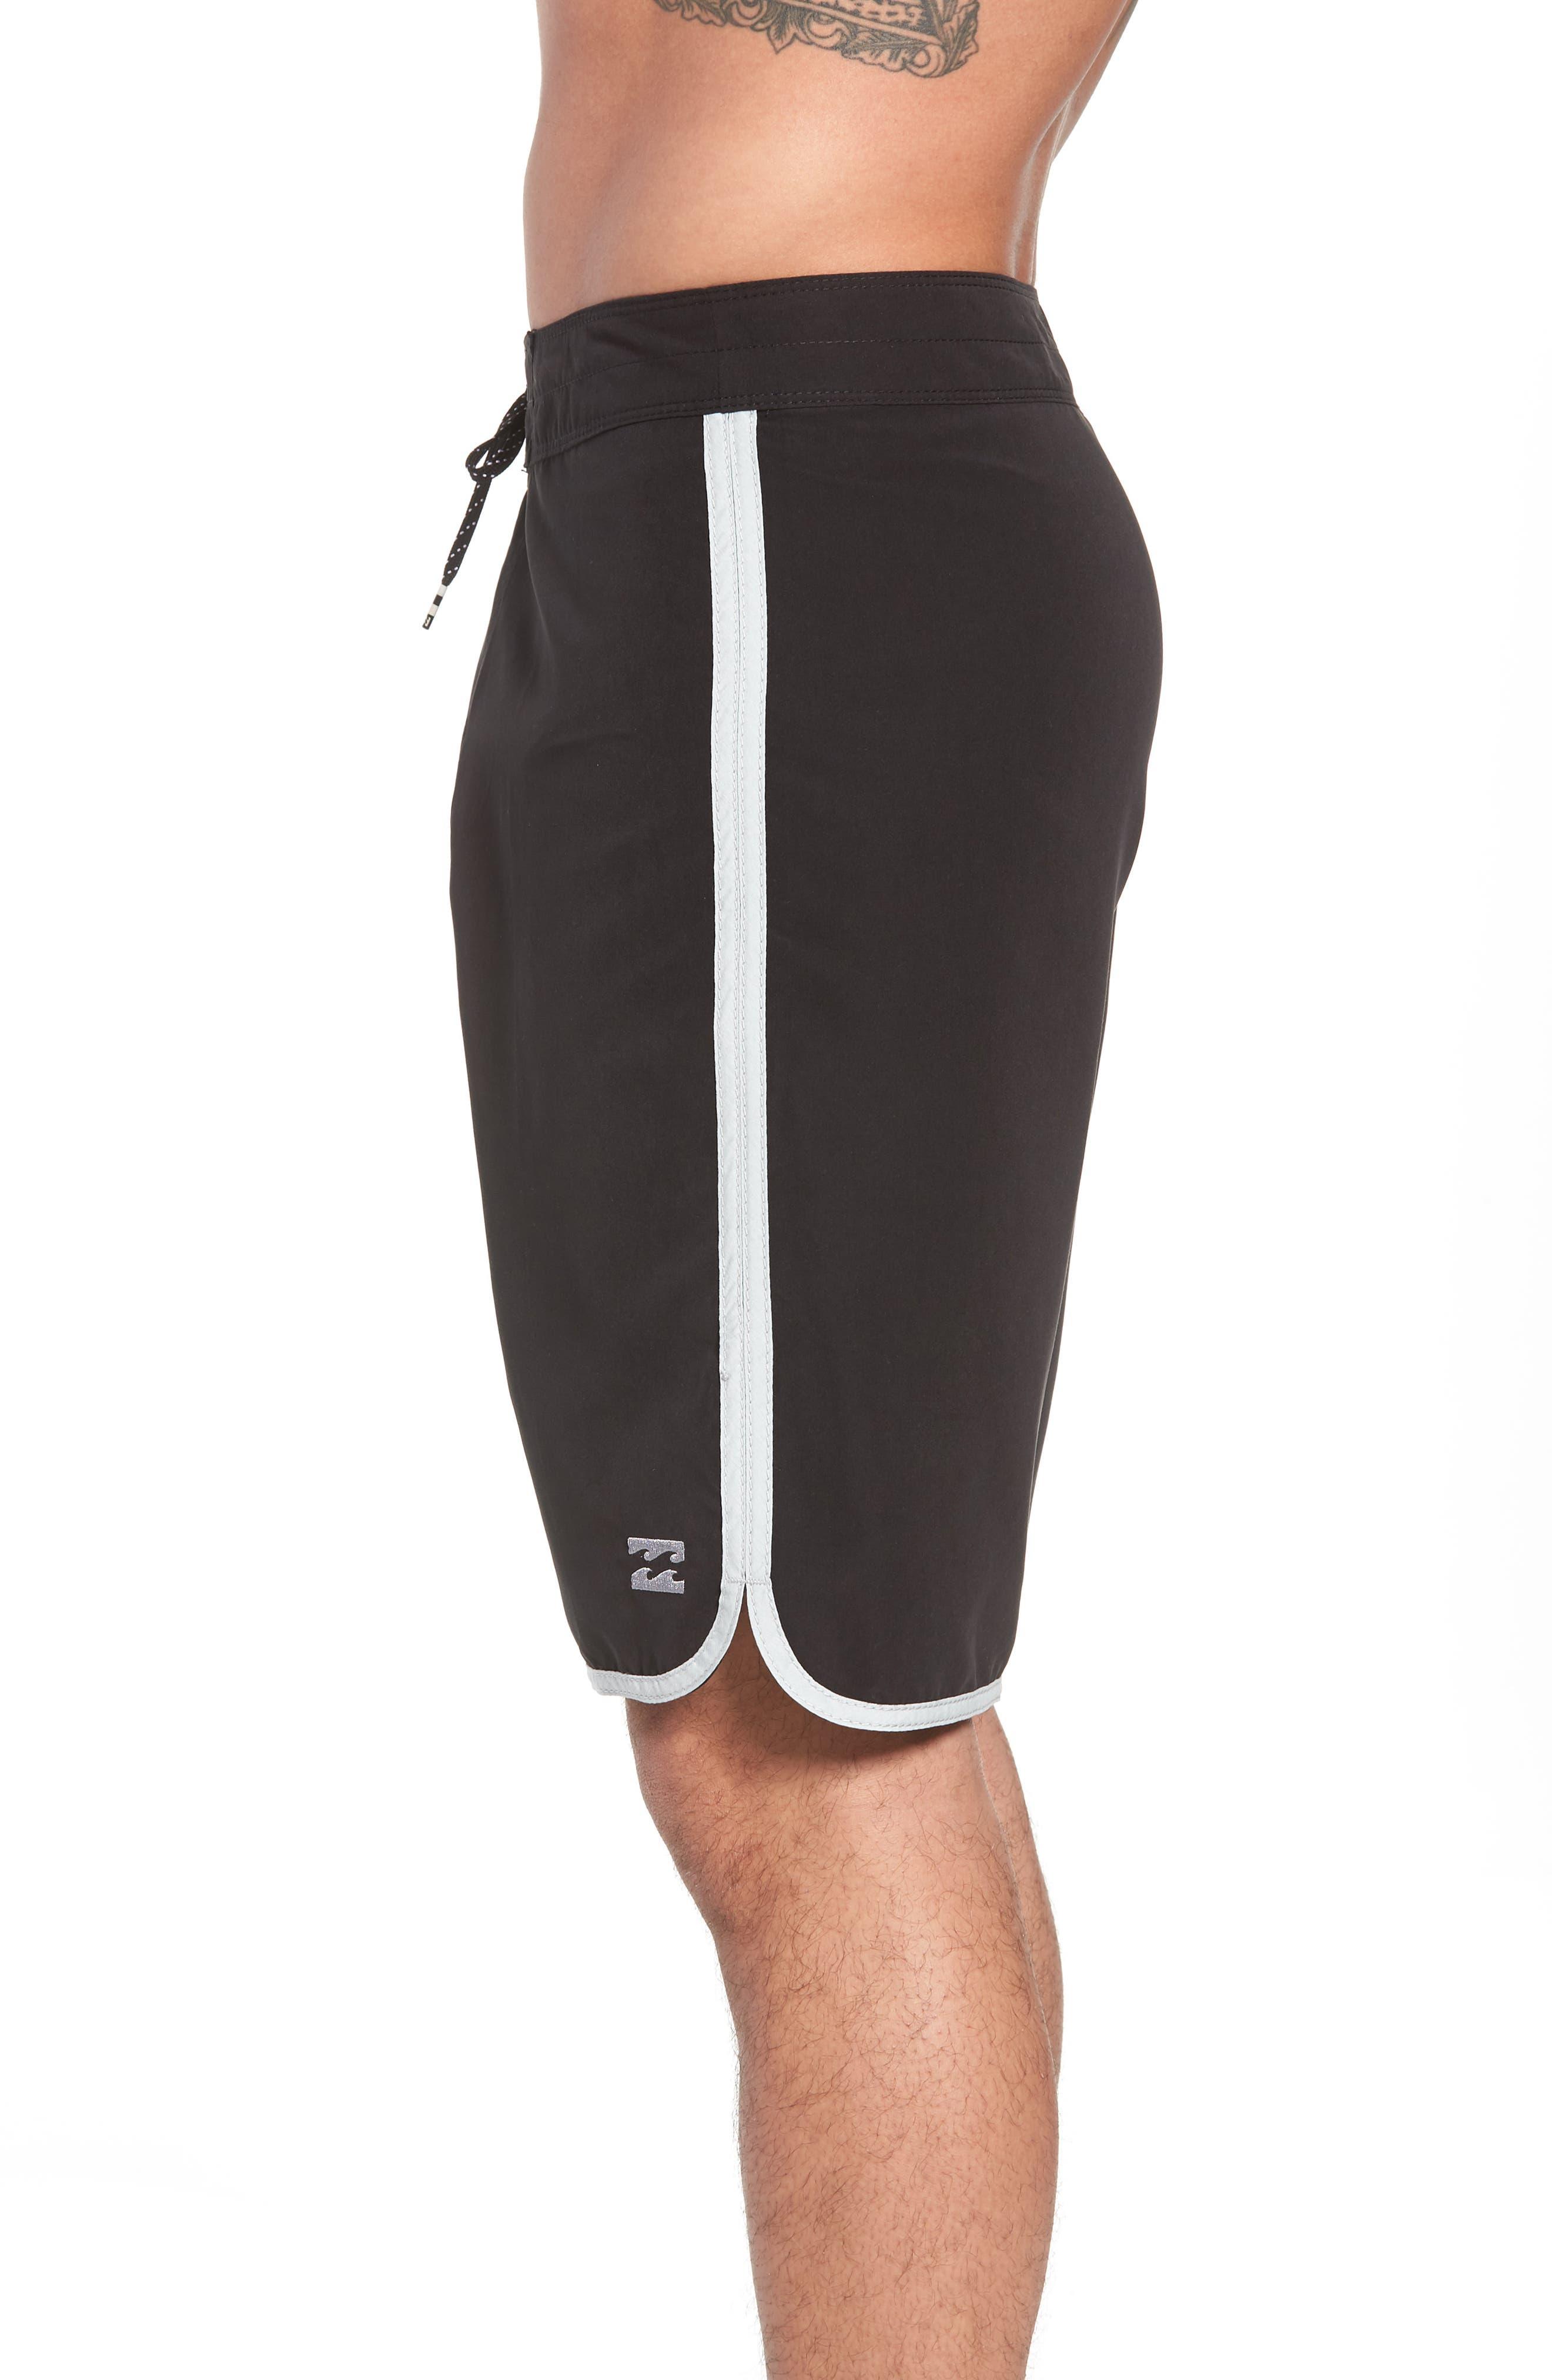 73 OG Board Shorts,                             Alternate thumbnail 3, color,                             Black